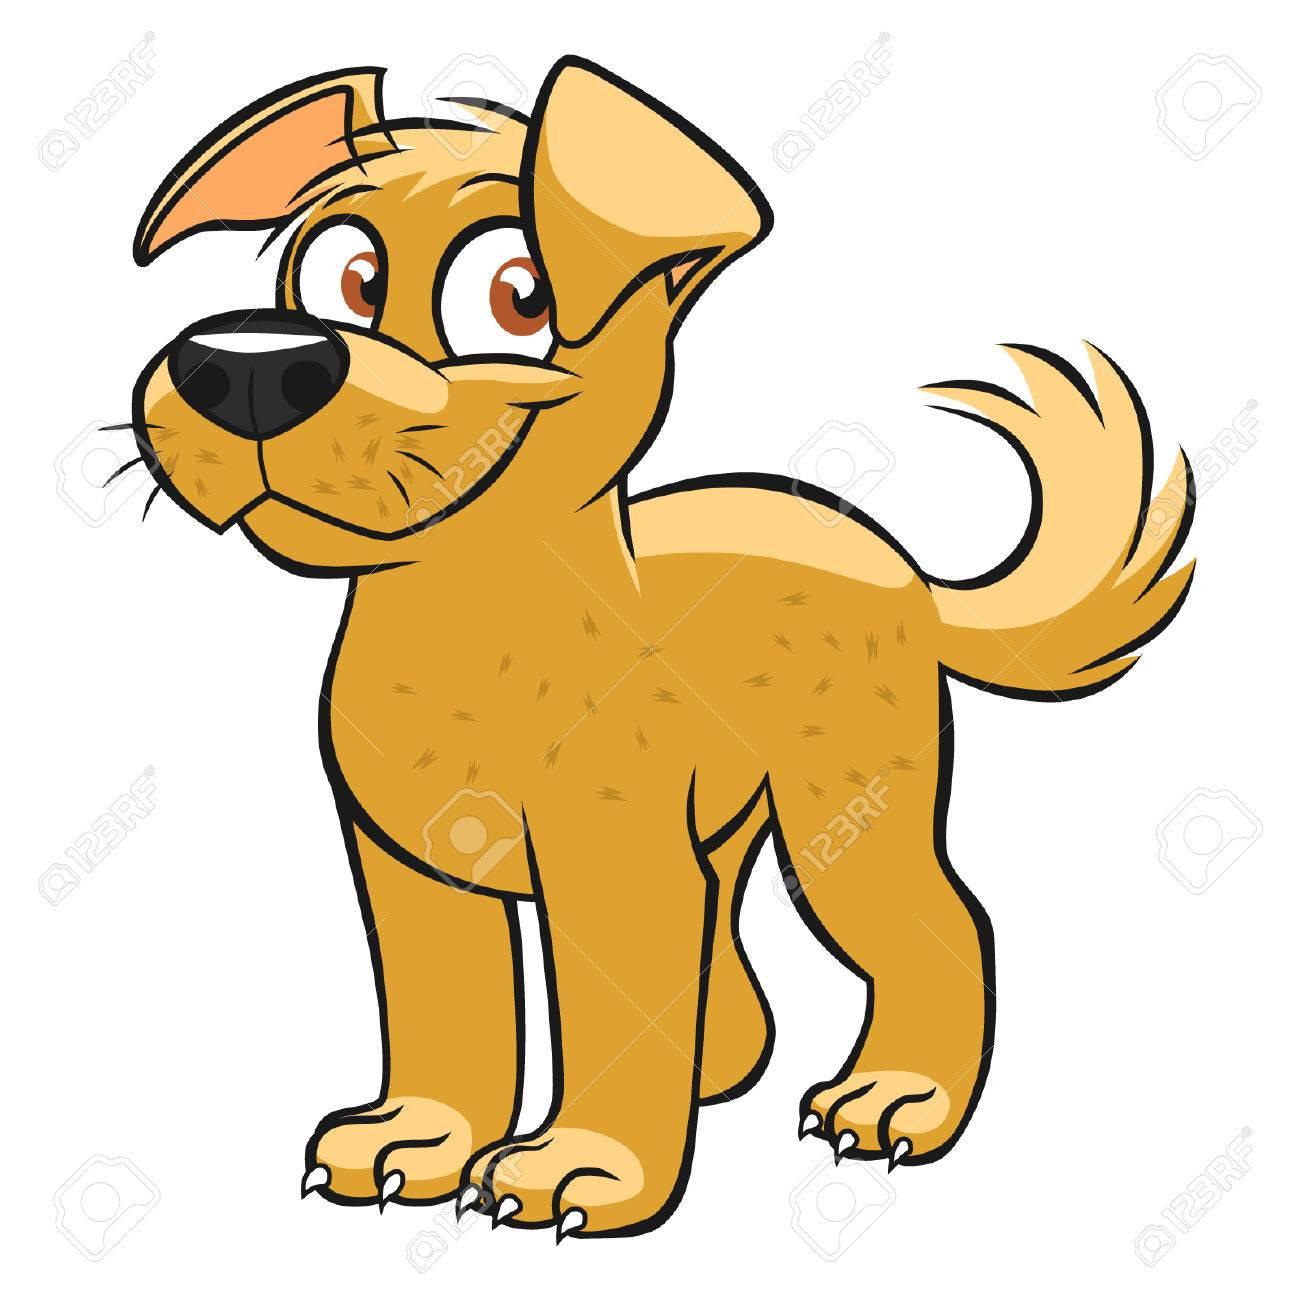 Cute cartoon dog - 43622210